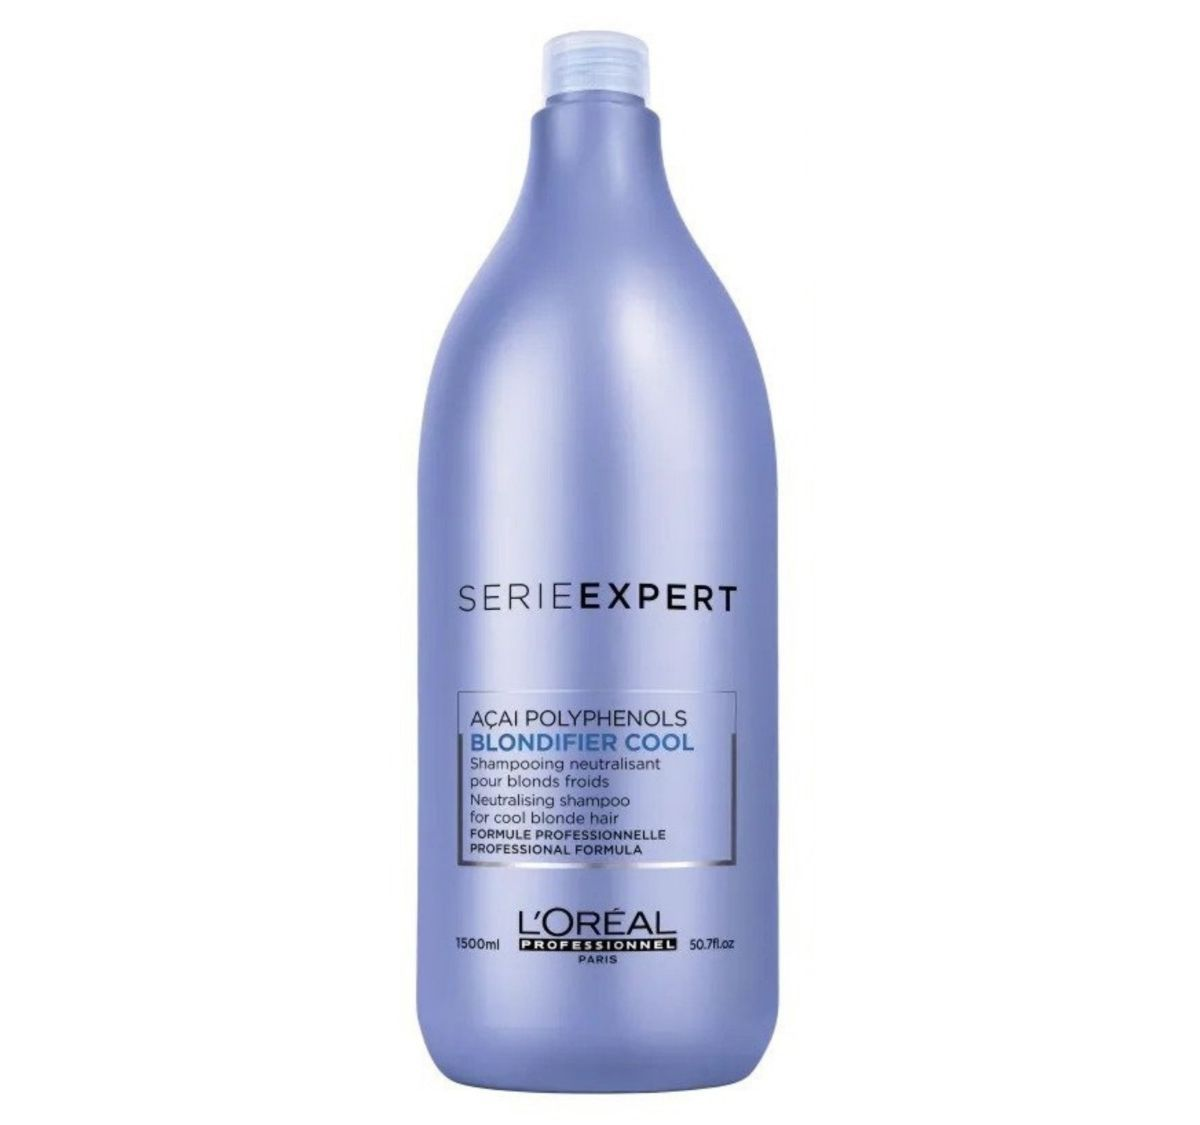 Shampoo Loreal Expert Blondifier Cool 1,5L